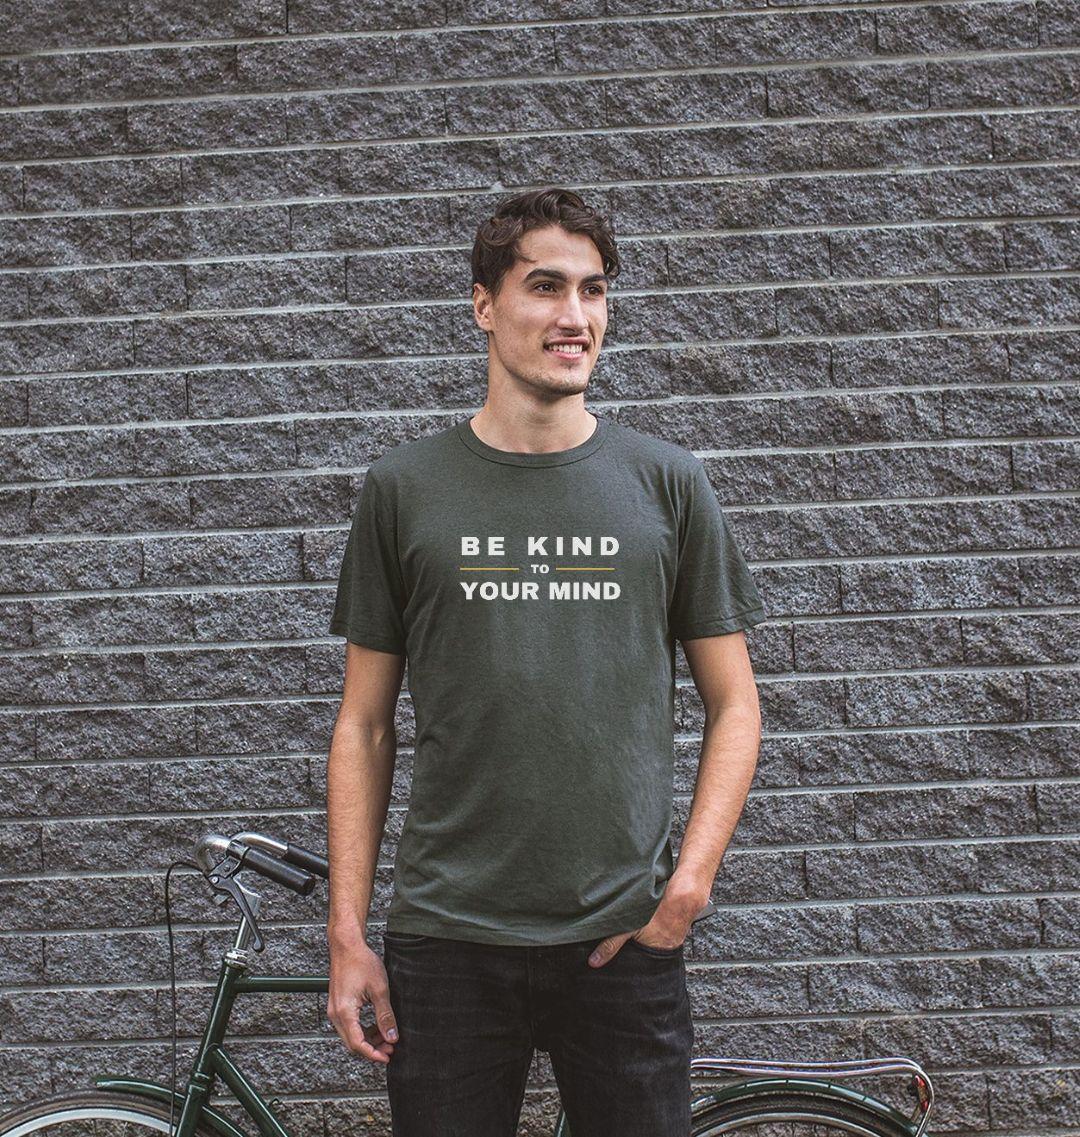 BE KIND TO YOUR MIND Mens Women's Unisex Mental Health T-shirt Top – Organic Cotton, Vegan Kind Shop 3